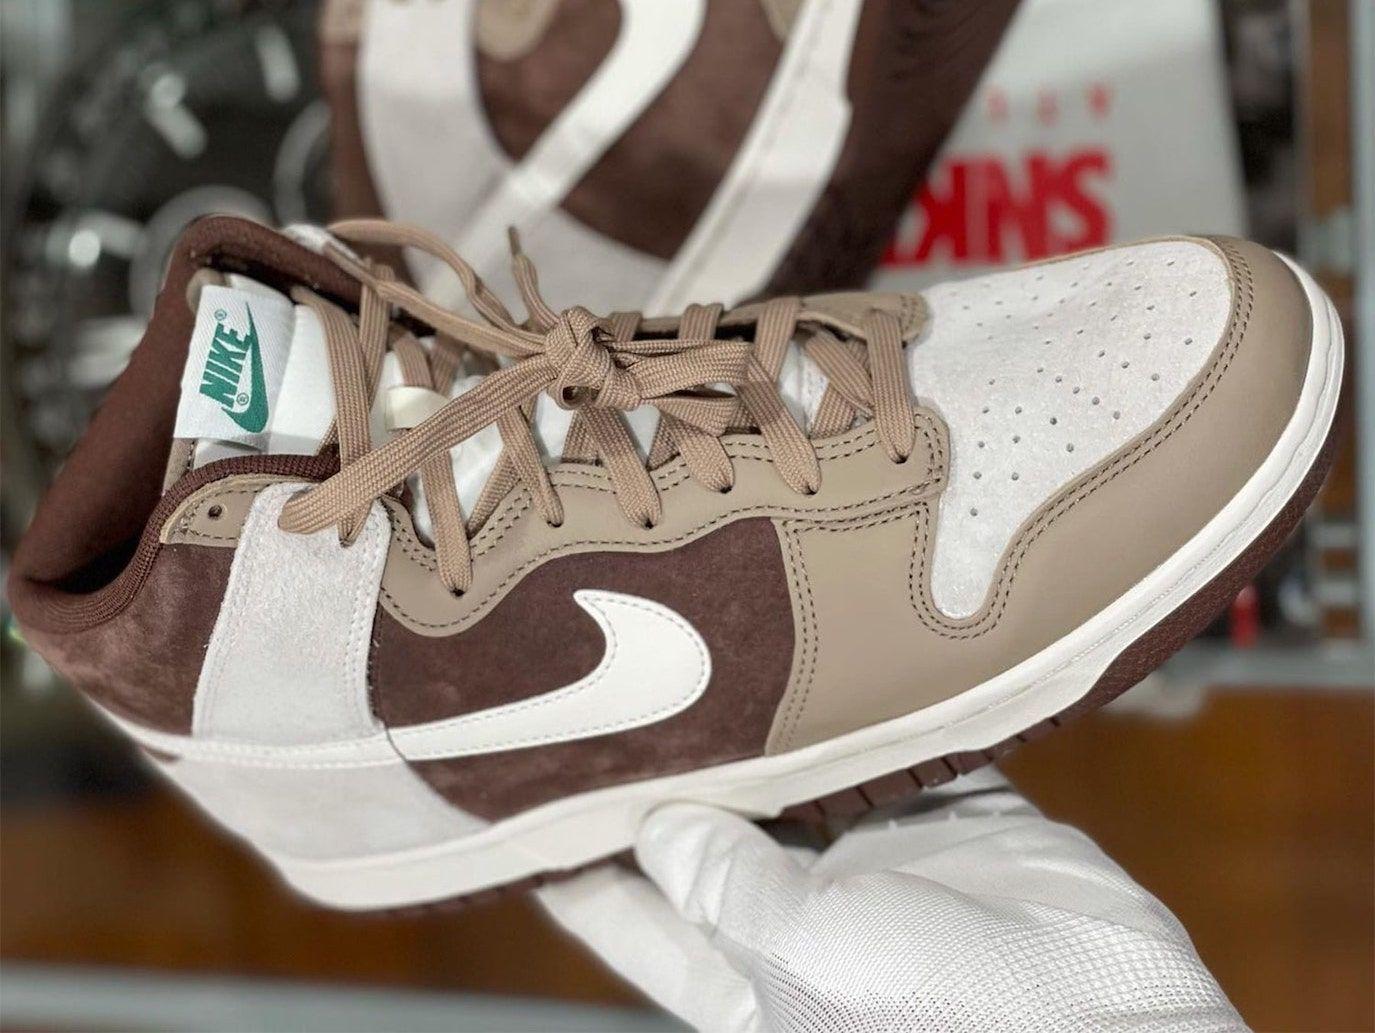 In-Hand: Nike Dunk High 'Light Chocolate'